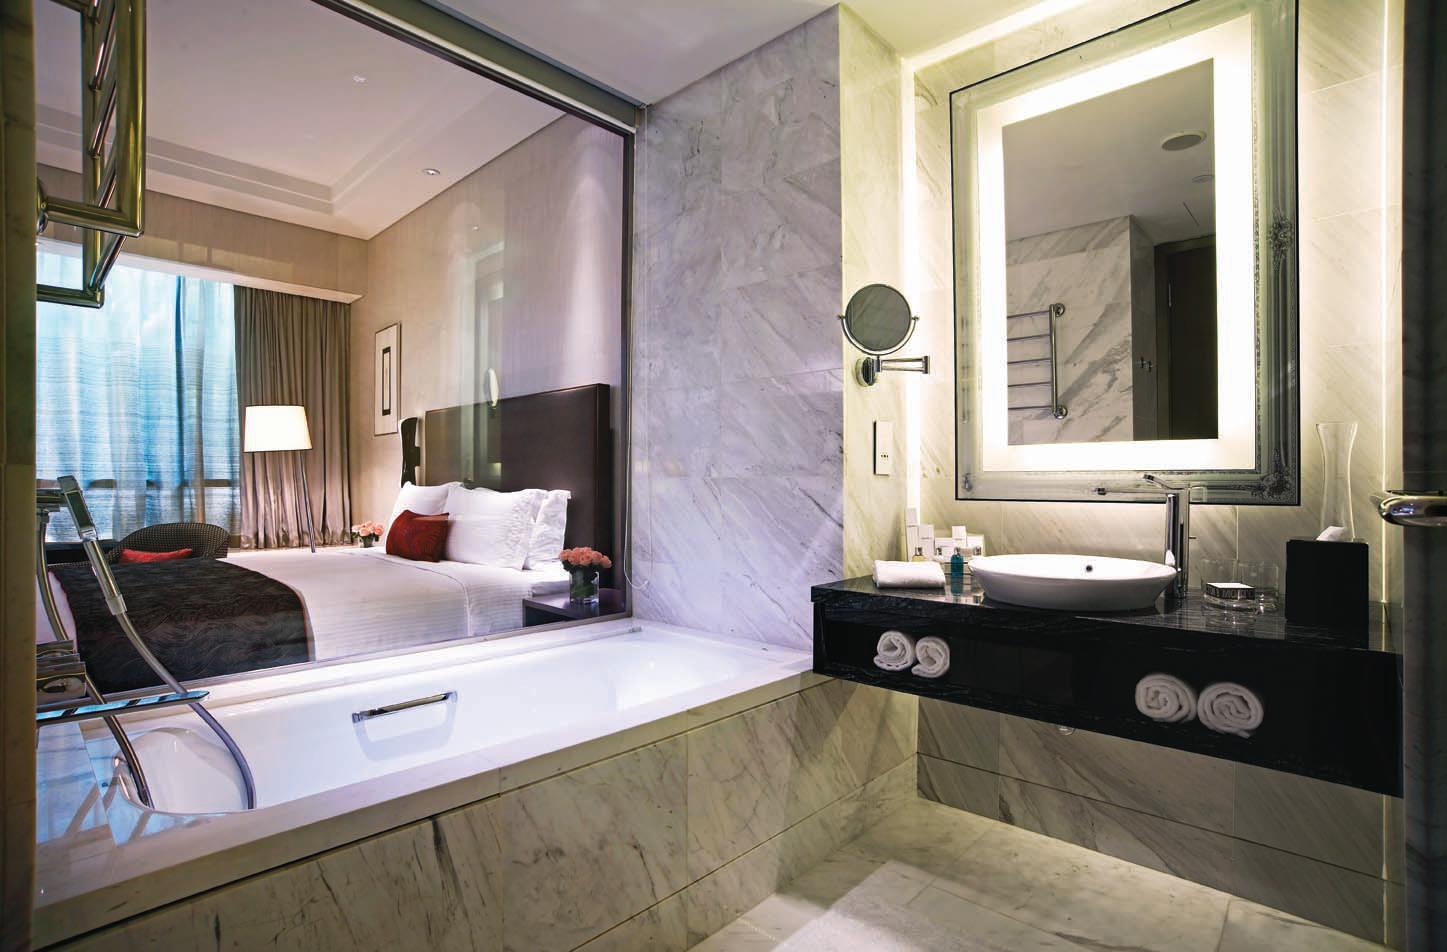 Kamar mandi di kamar tipe Carlton Club.